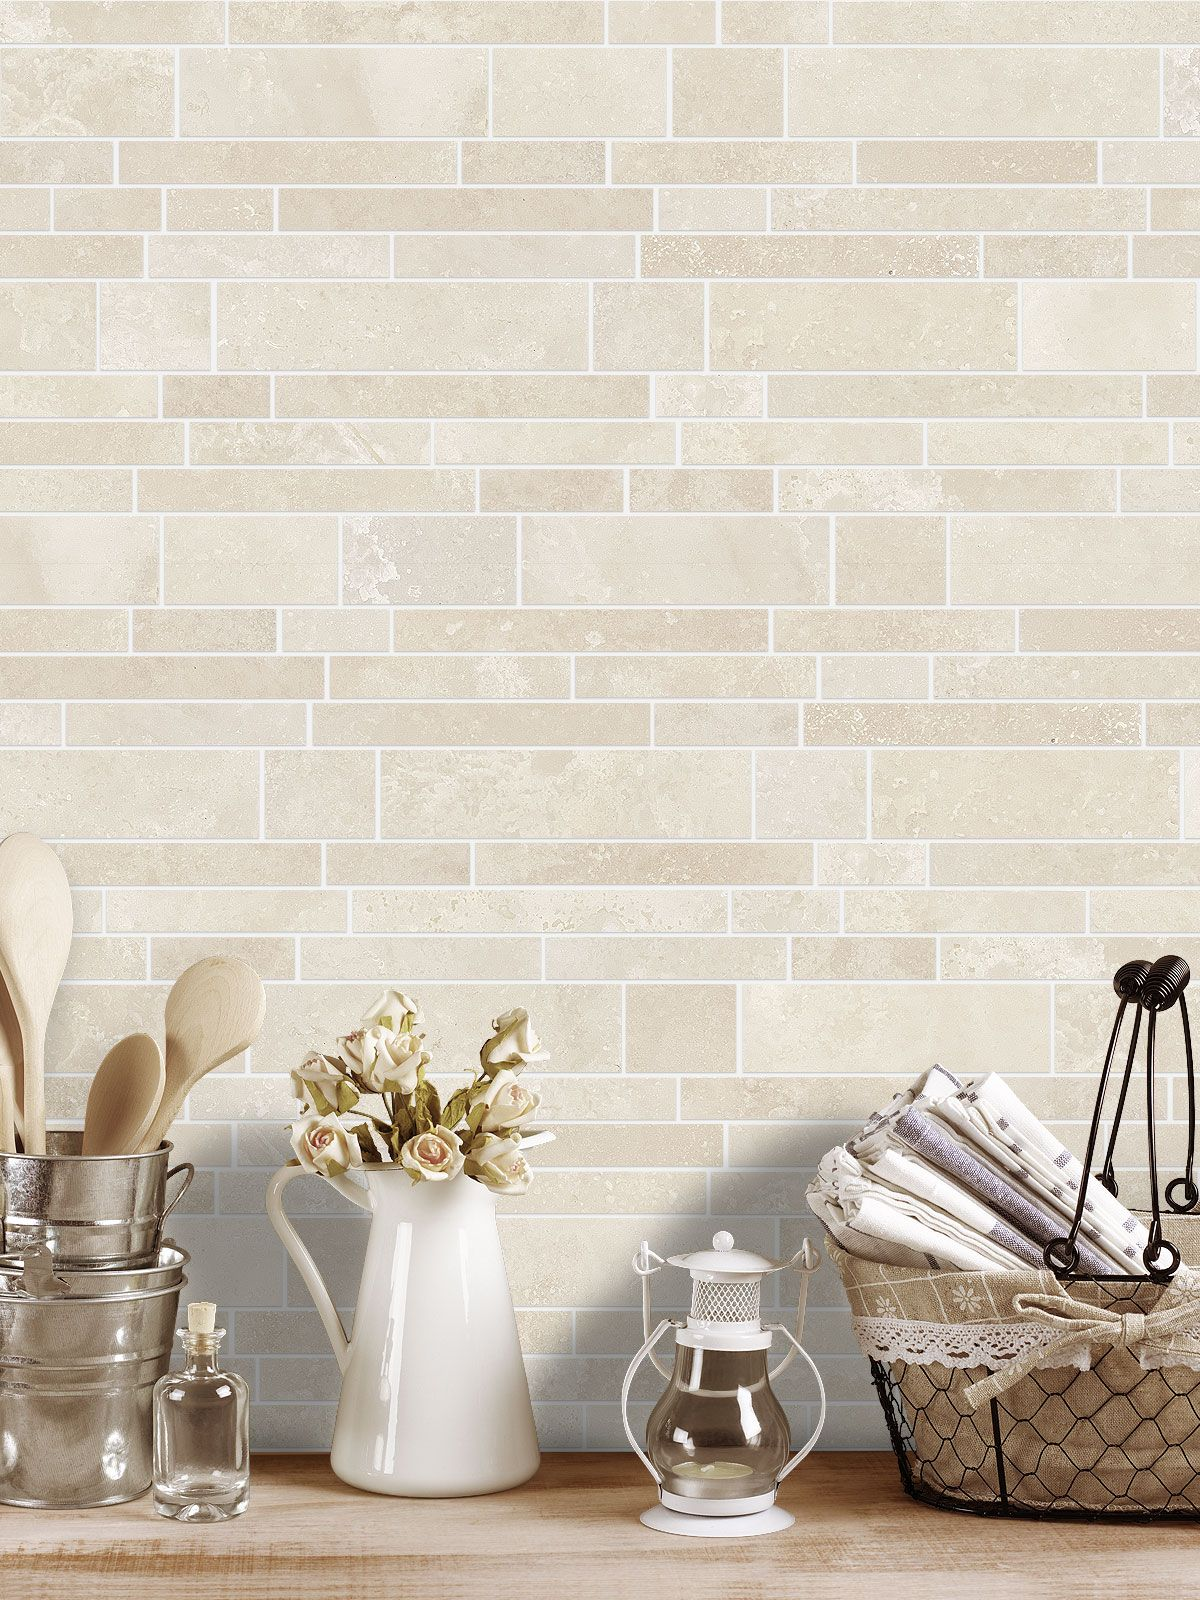 Photo of Light ivory Travertine Kitchen Subway Backsplash Tile | Backsplash.com